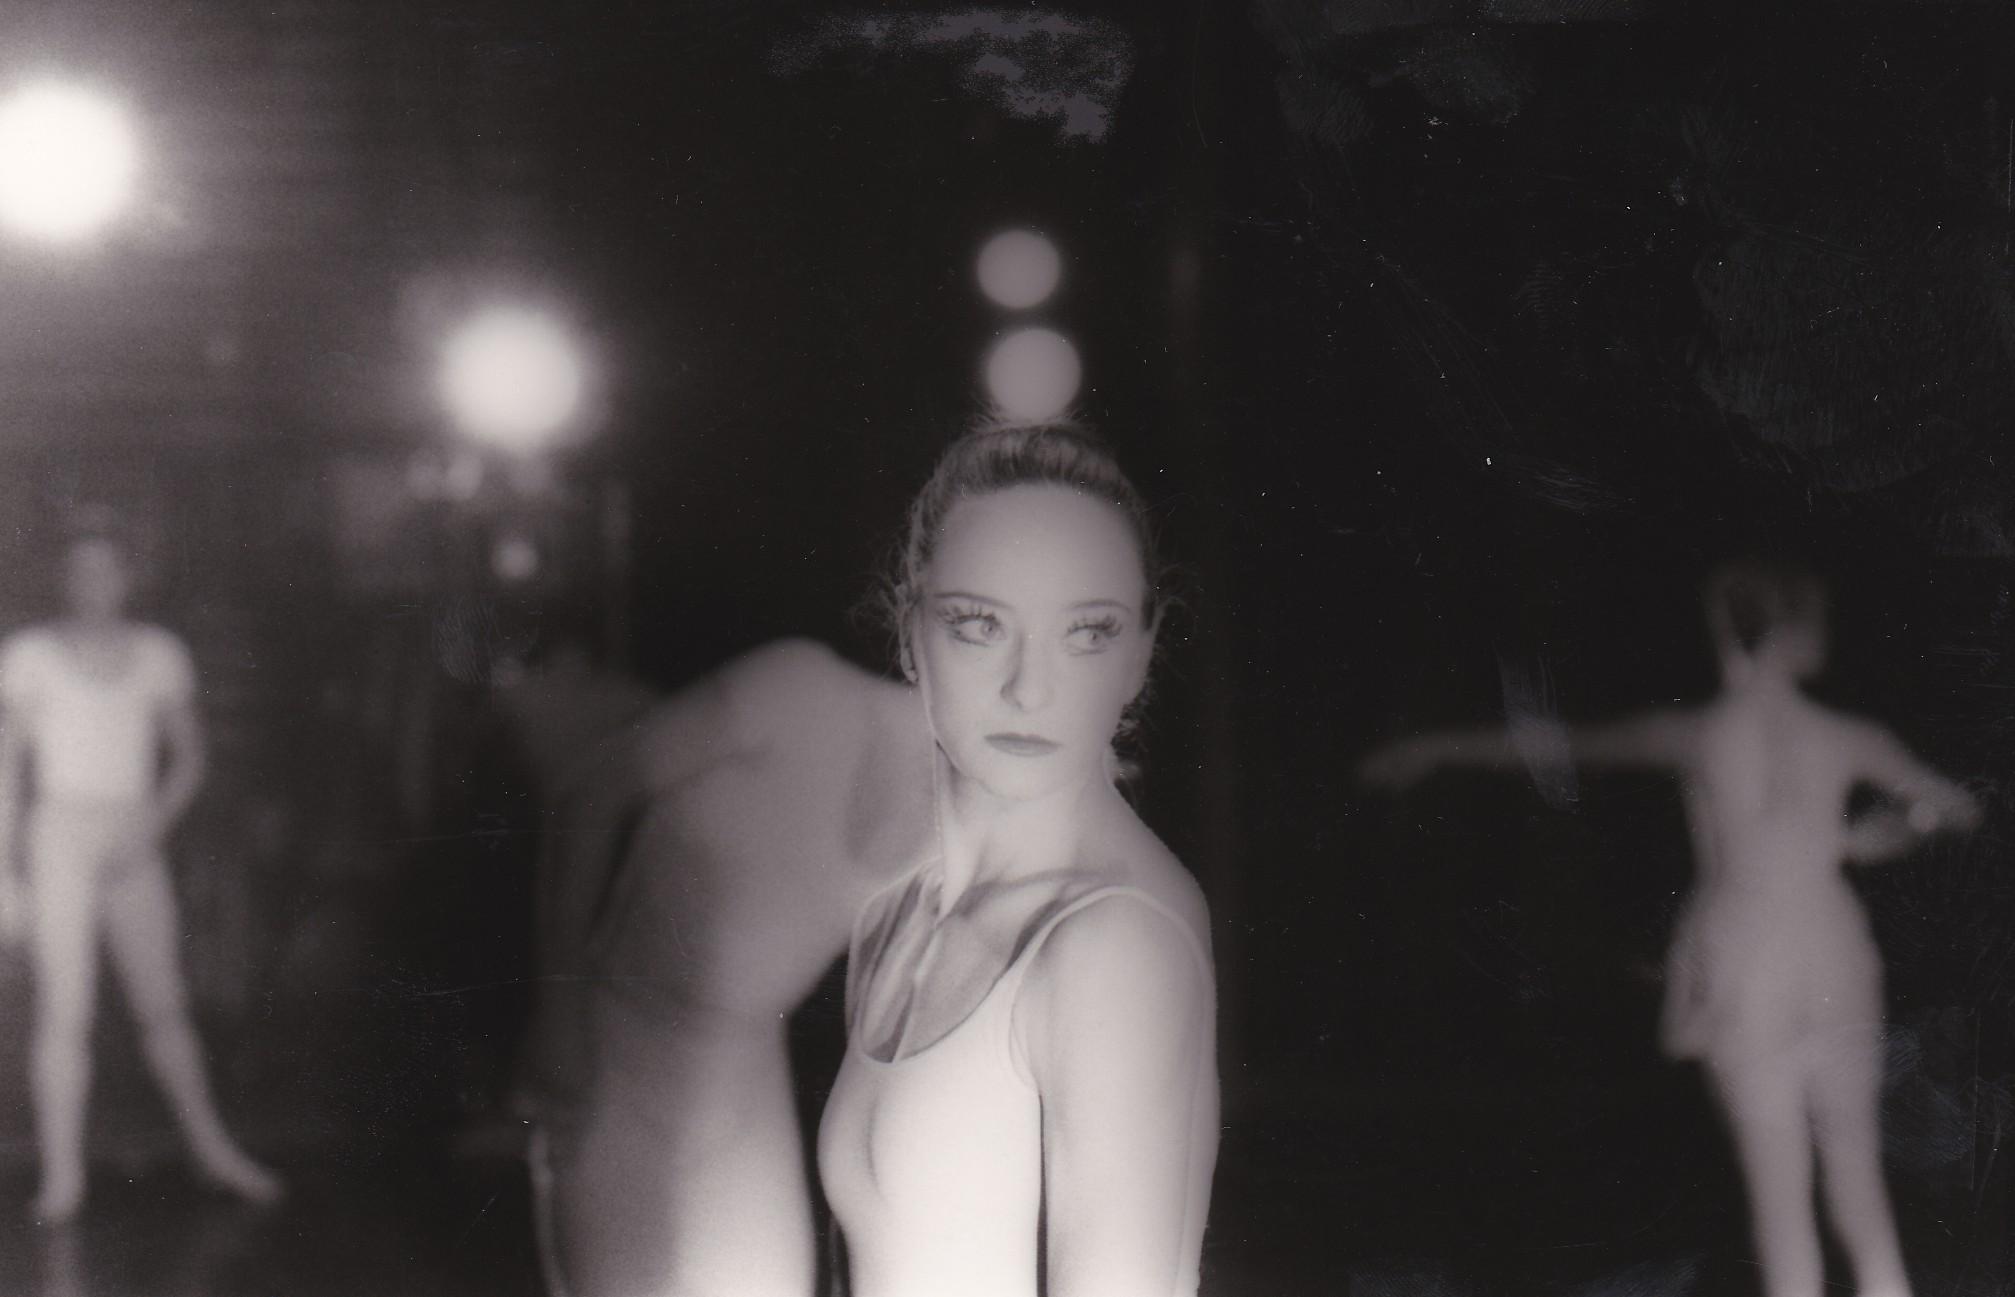 Danseuse Etoile, Margaret Claire Torrini Pélissier, Sohaleila